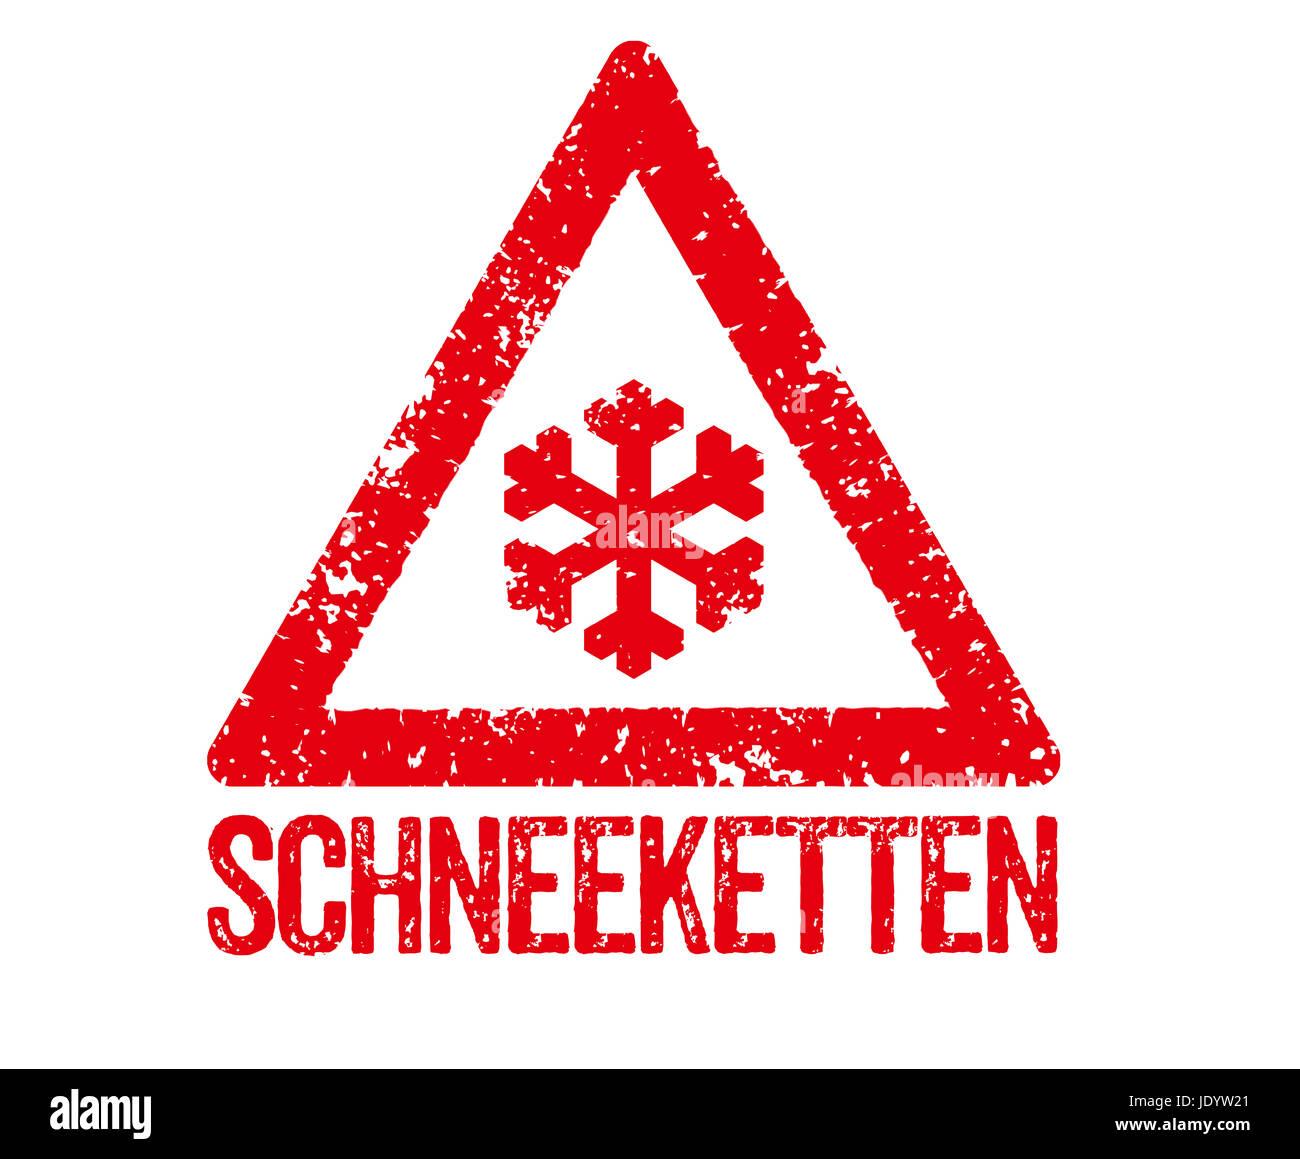 Roter Stempel - Schneeketten Stock Photo